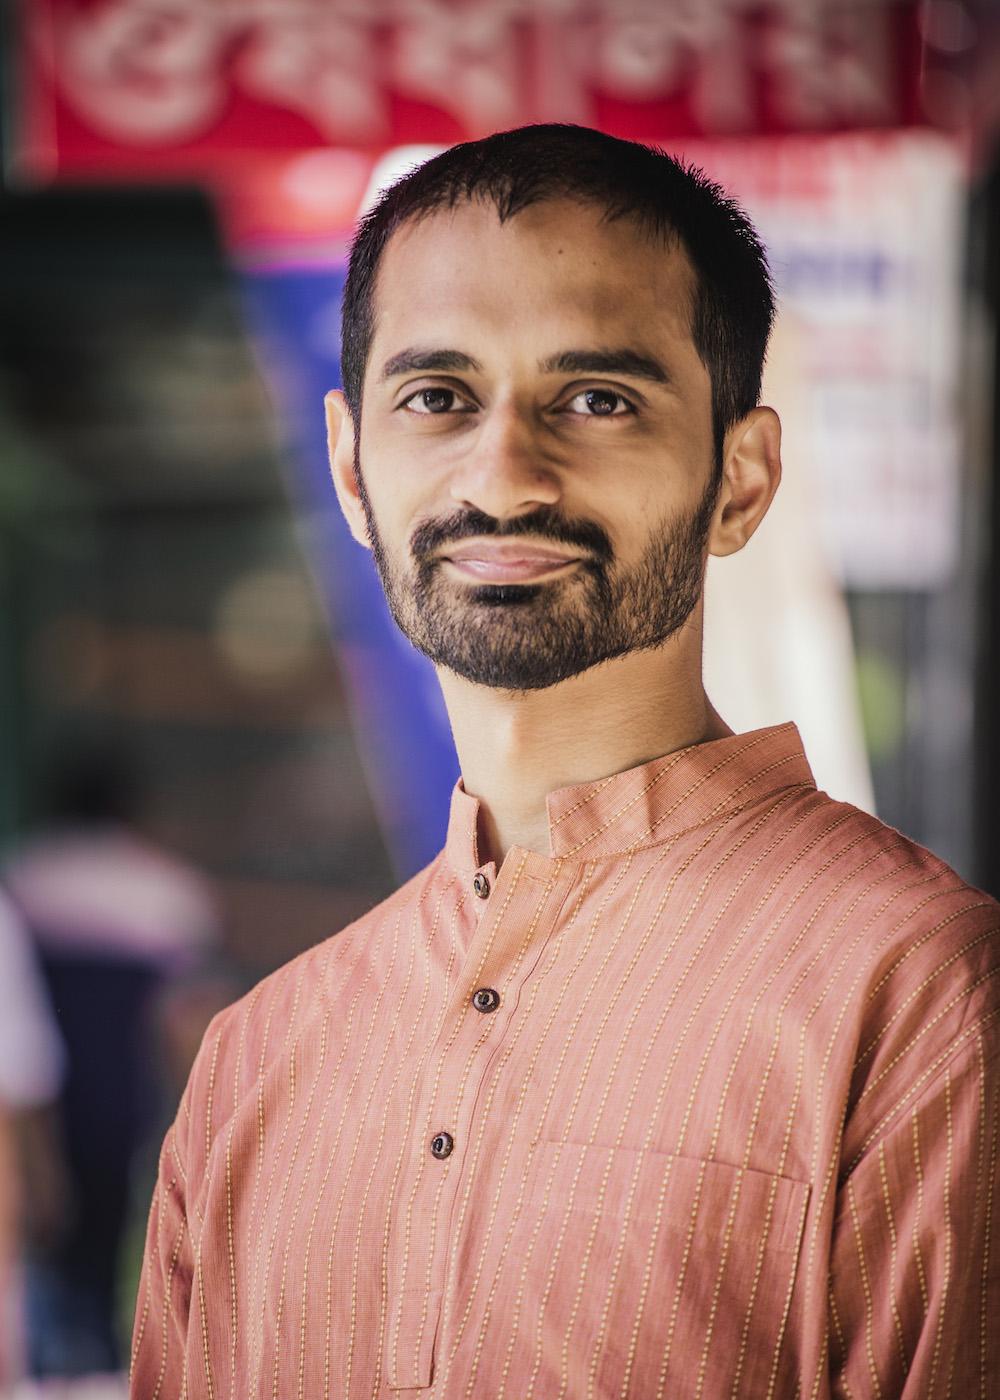 Fahd Ahmed, Executive Director, Desis Rising Up & Moving (DRUM), @DesisRisingUp